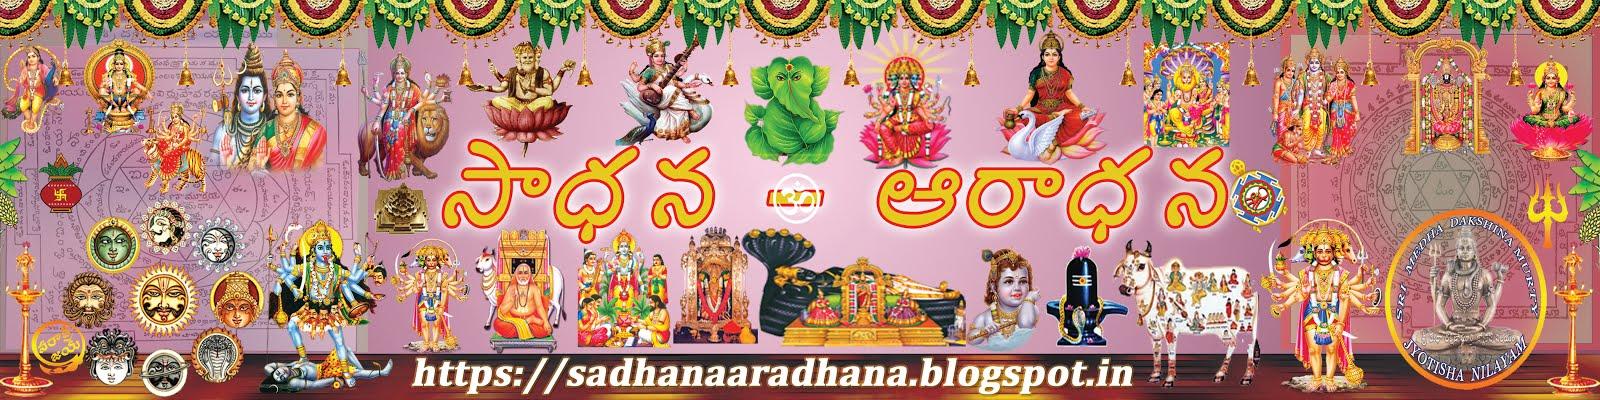 సాధన  ఆరాధన ॐ SADHANA ARADHANA